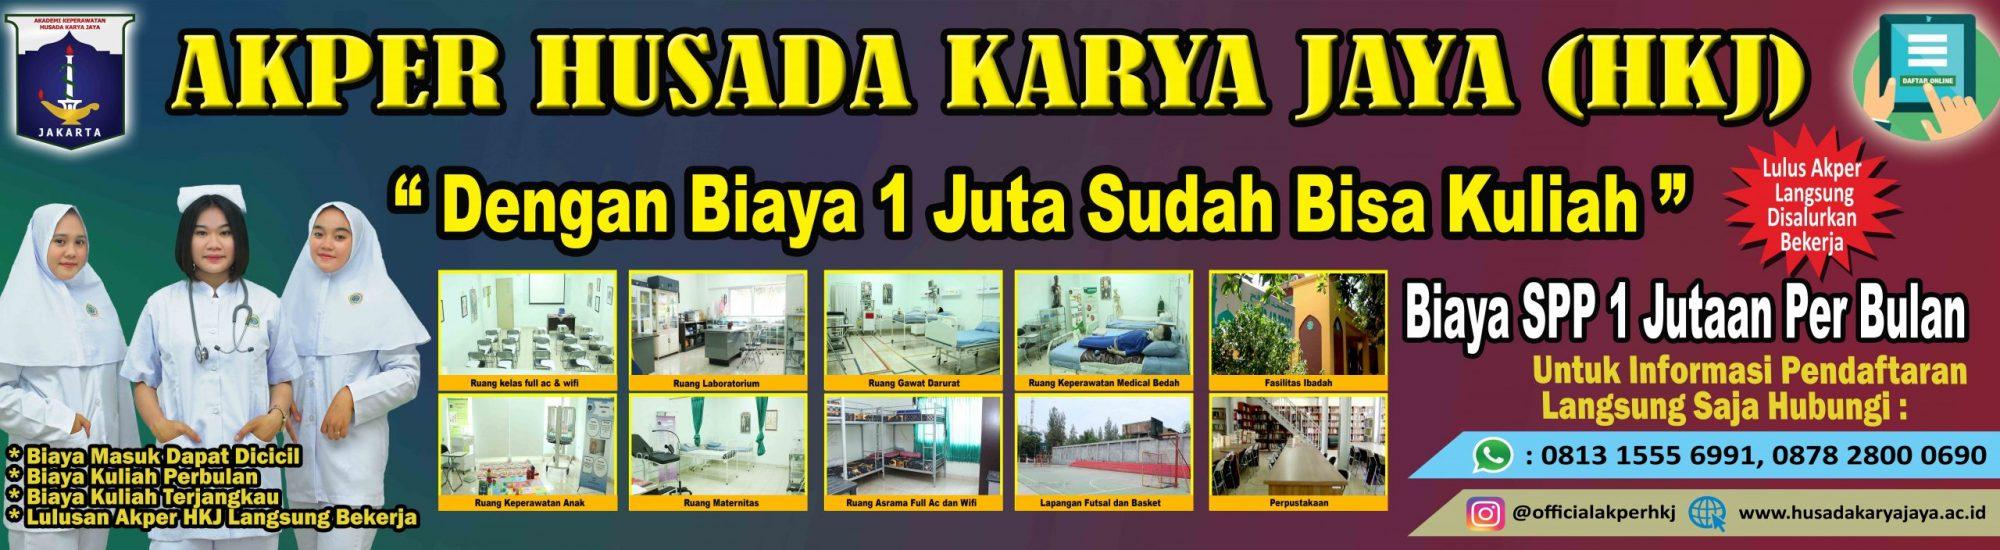 "Akademi Keperawatan Husada Karya Jaya (HKJ) "" Create Professional Nurses"""